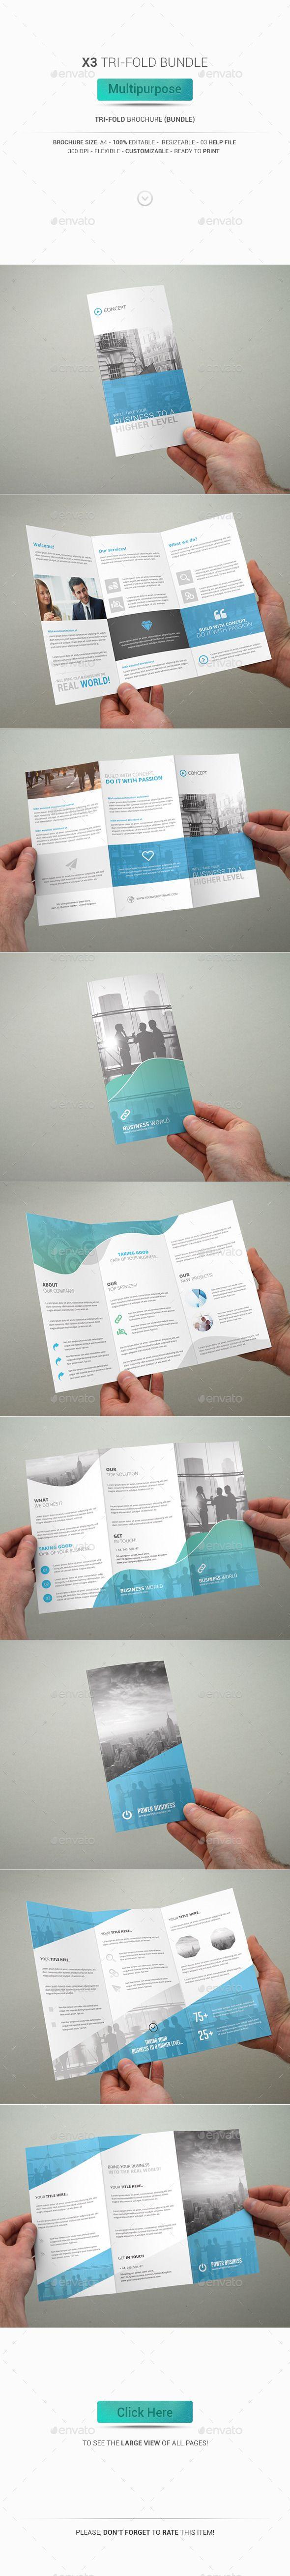 3 Tri-Fold Brochure Bundle - Multipurpose - Corporate Brochure Template PSD. Download here: http://graphicriver.net/item/3-trifold-brochure-bundle-multipurpose/12838668?s_rank=1774&ref=yinkira